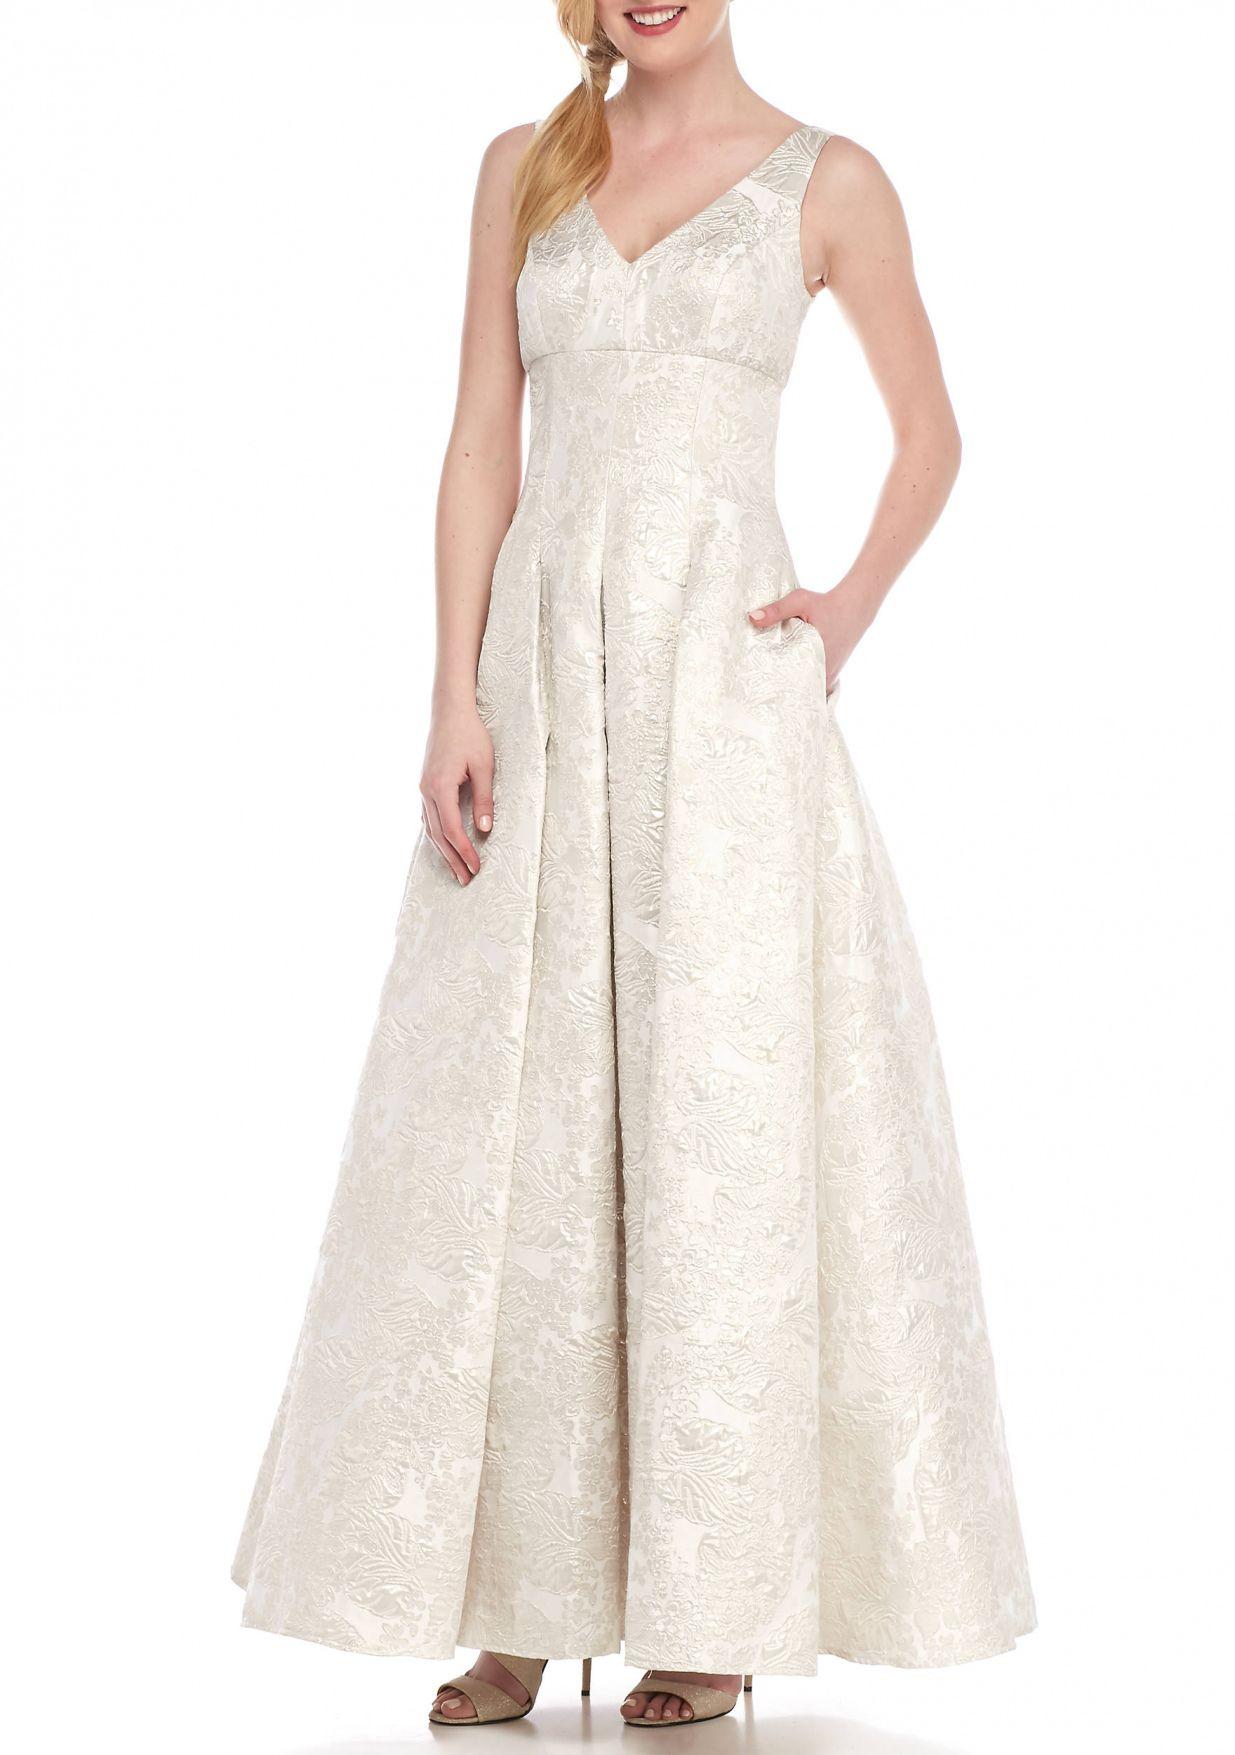 20+ Belk Wedding Dresses - Best Shapewear for Wedding Dress Check ...